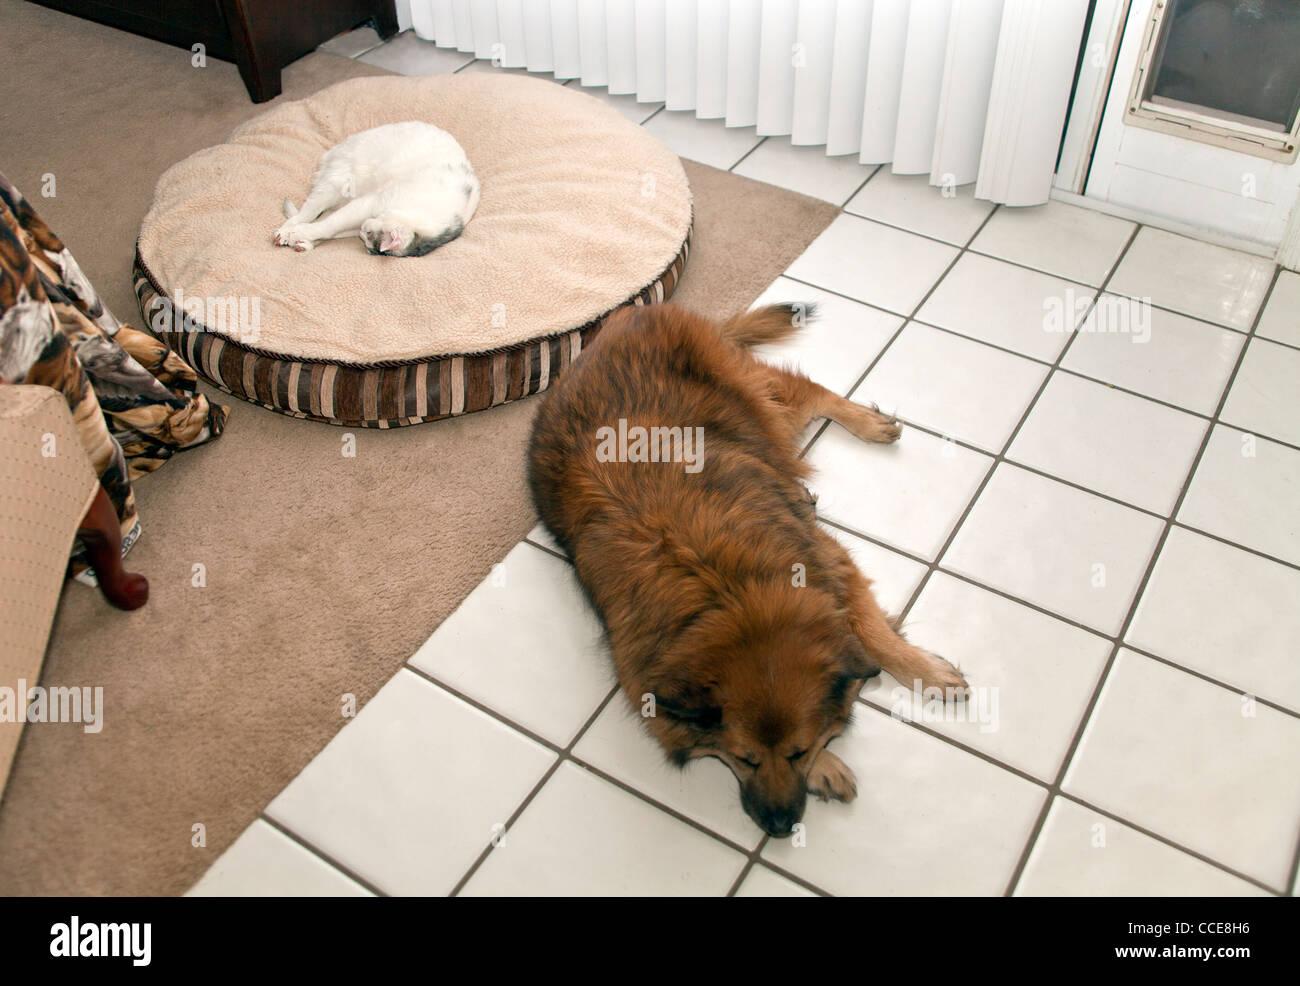 Cat asleep sleeps on dogs bed while dog sleeps on hard floor. top view above MR  © Myrleen Pearson - Stock Image